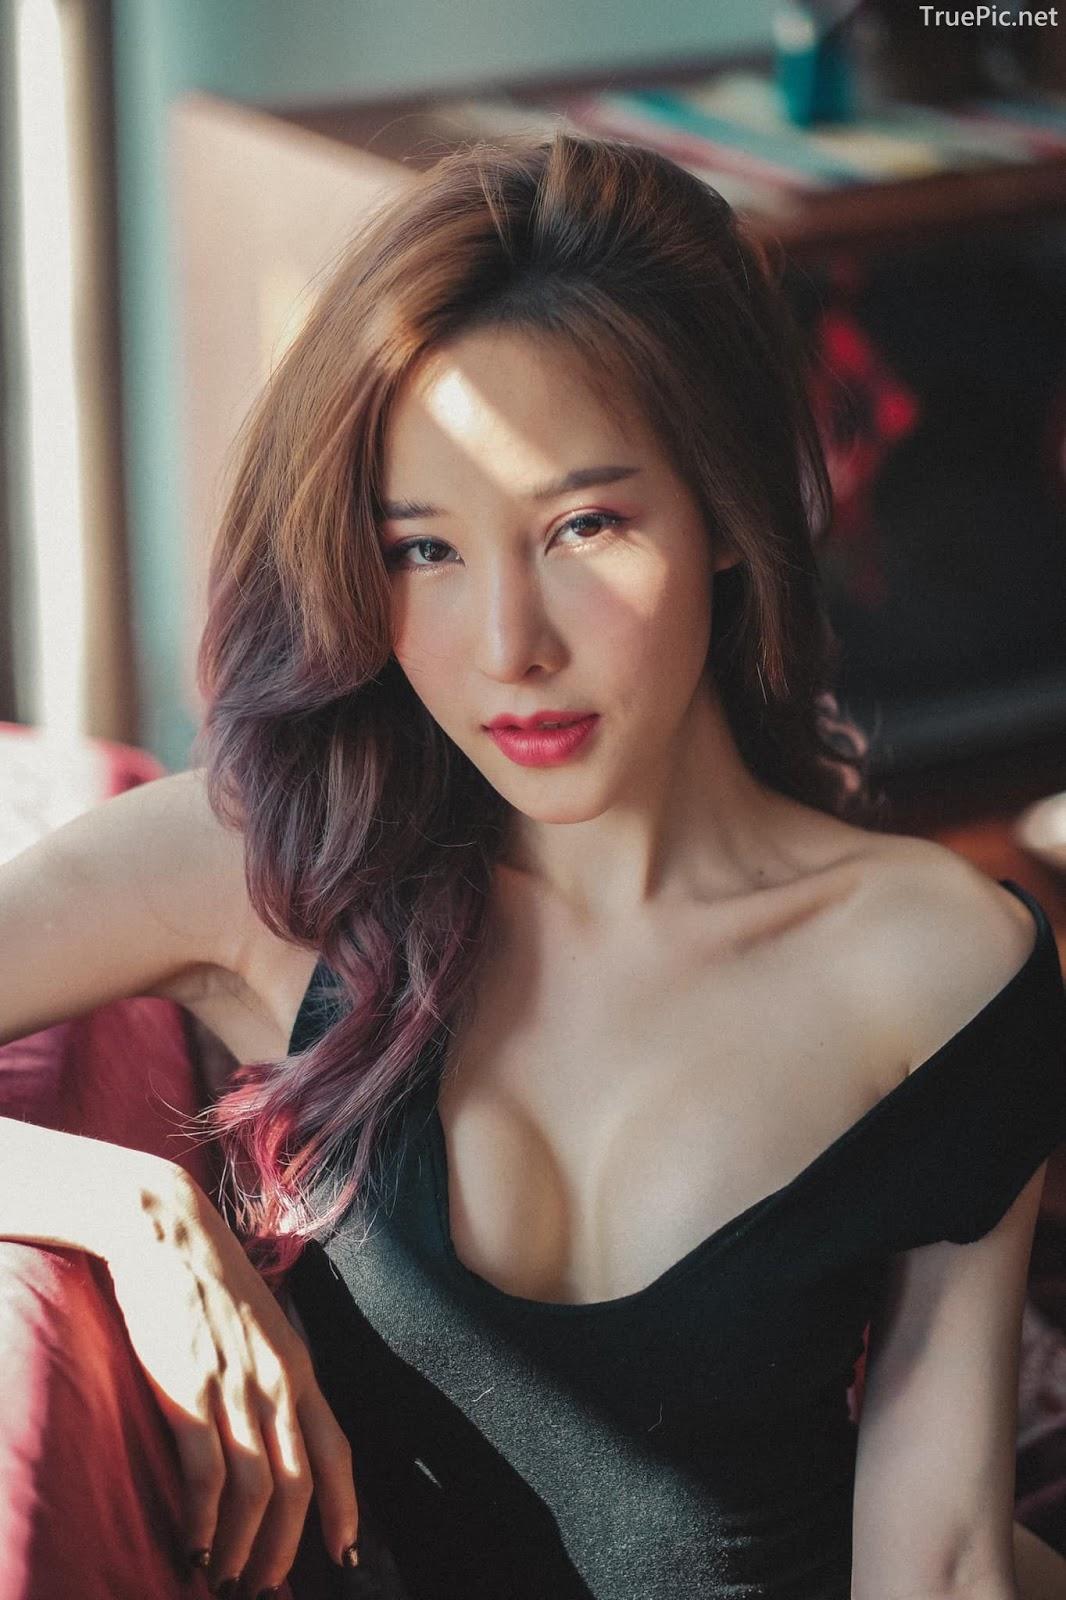 Thailand model - Arys Nam-in (Arysiacara) - Black Rose feeling the sun - Picture 6